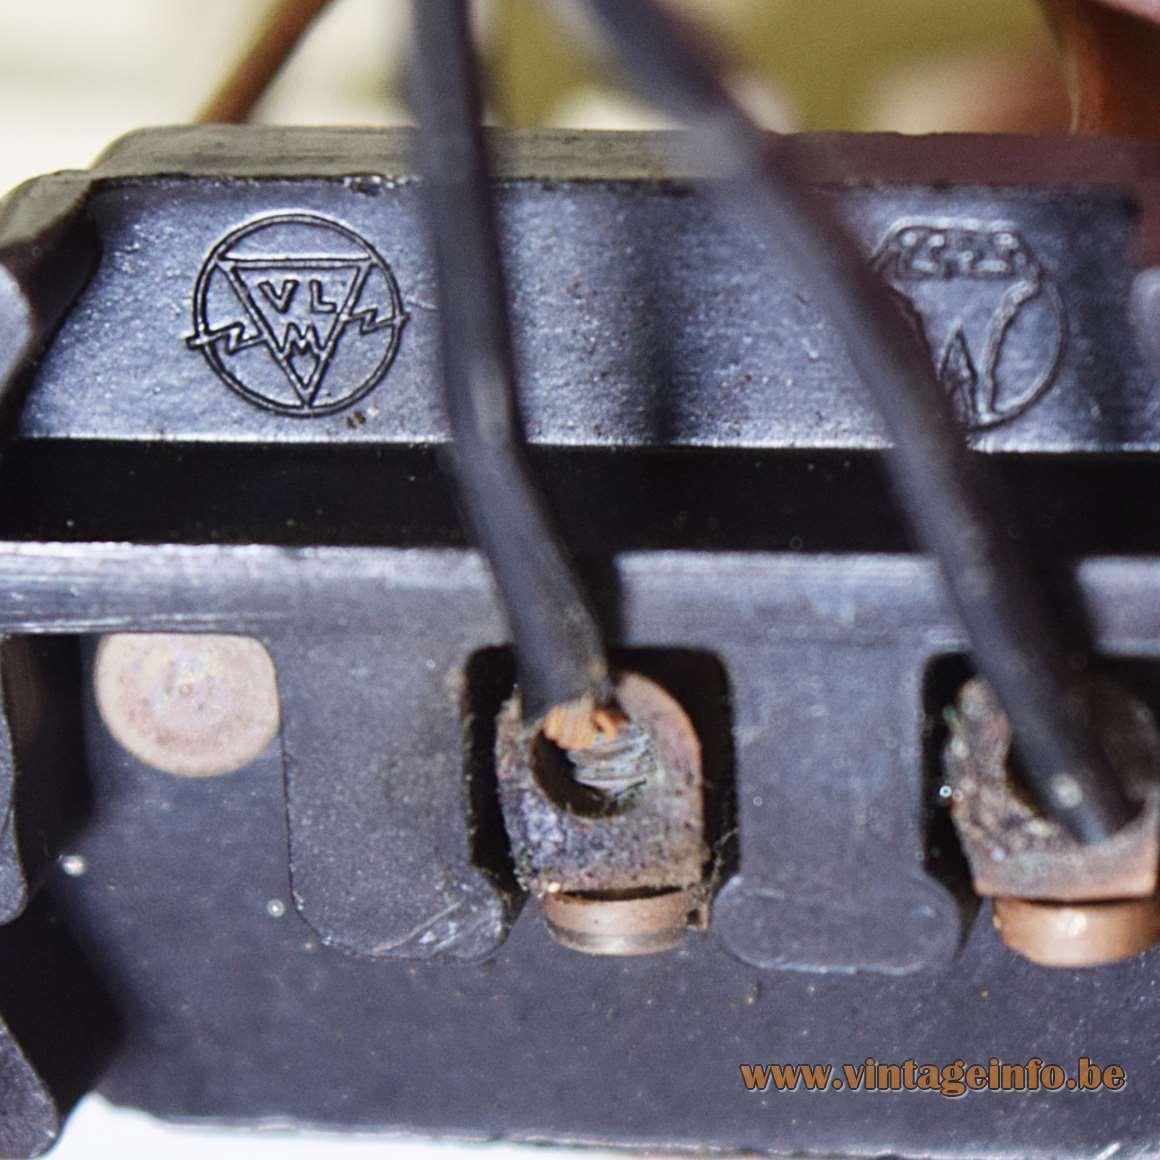 1950s Lantern Pendant Lamp - VLM Components socket